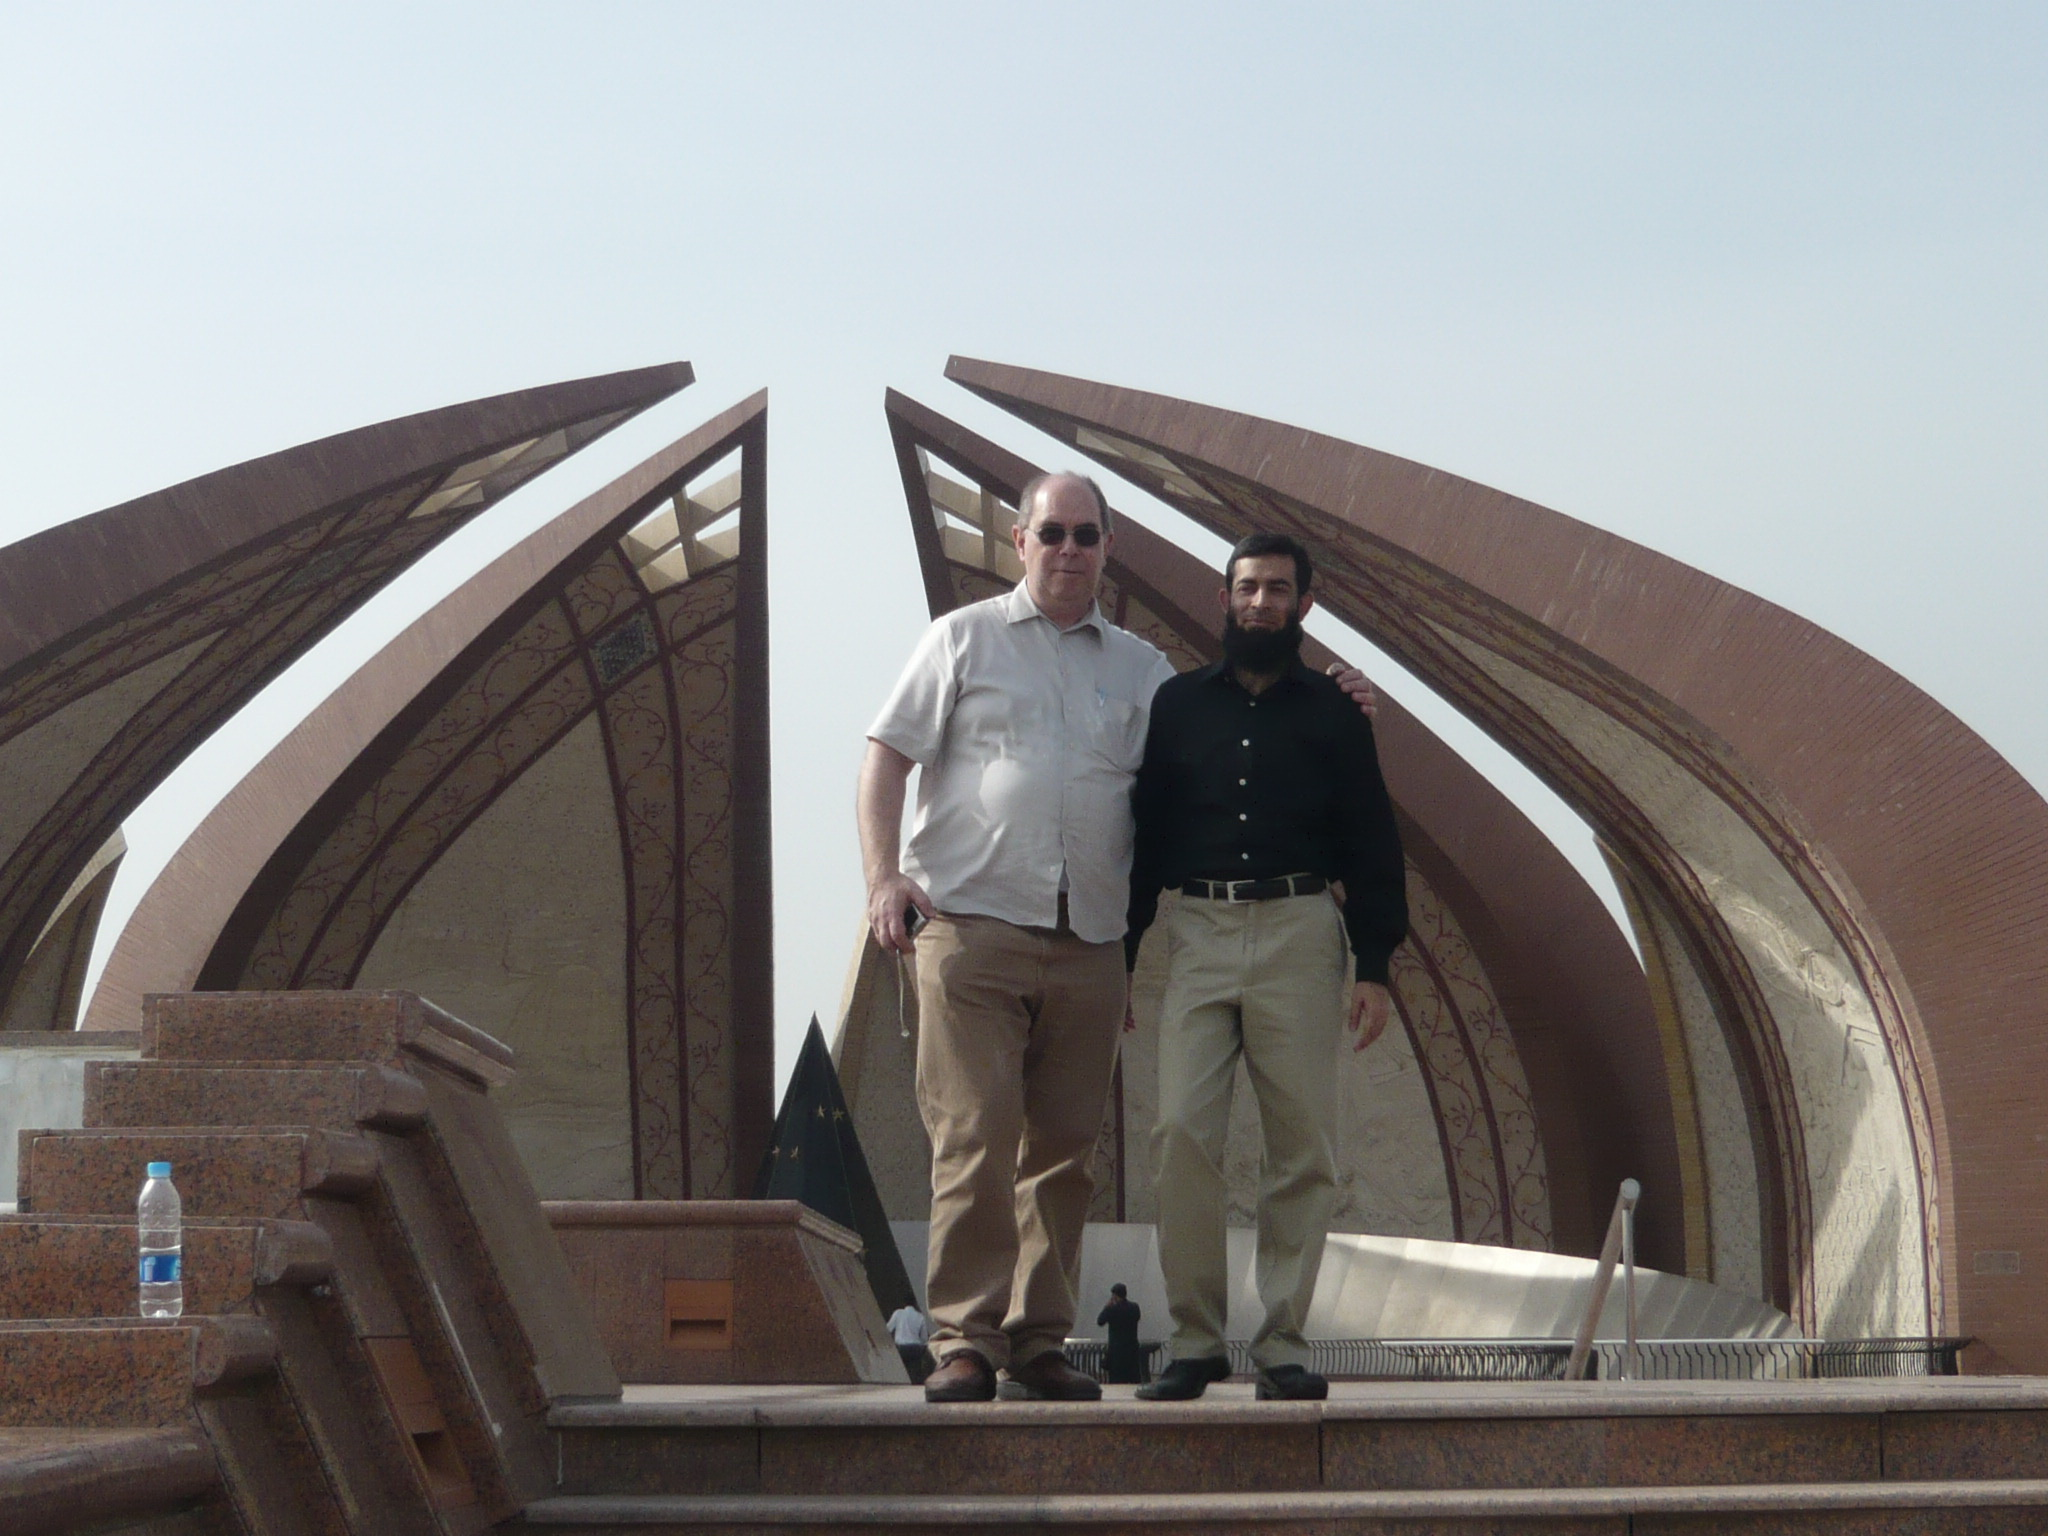 In islamabad